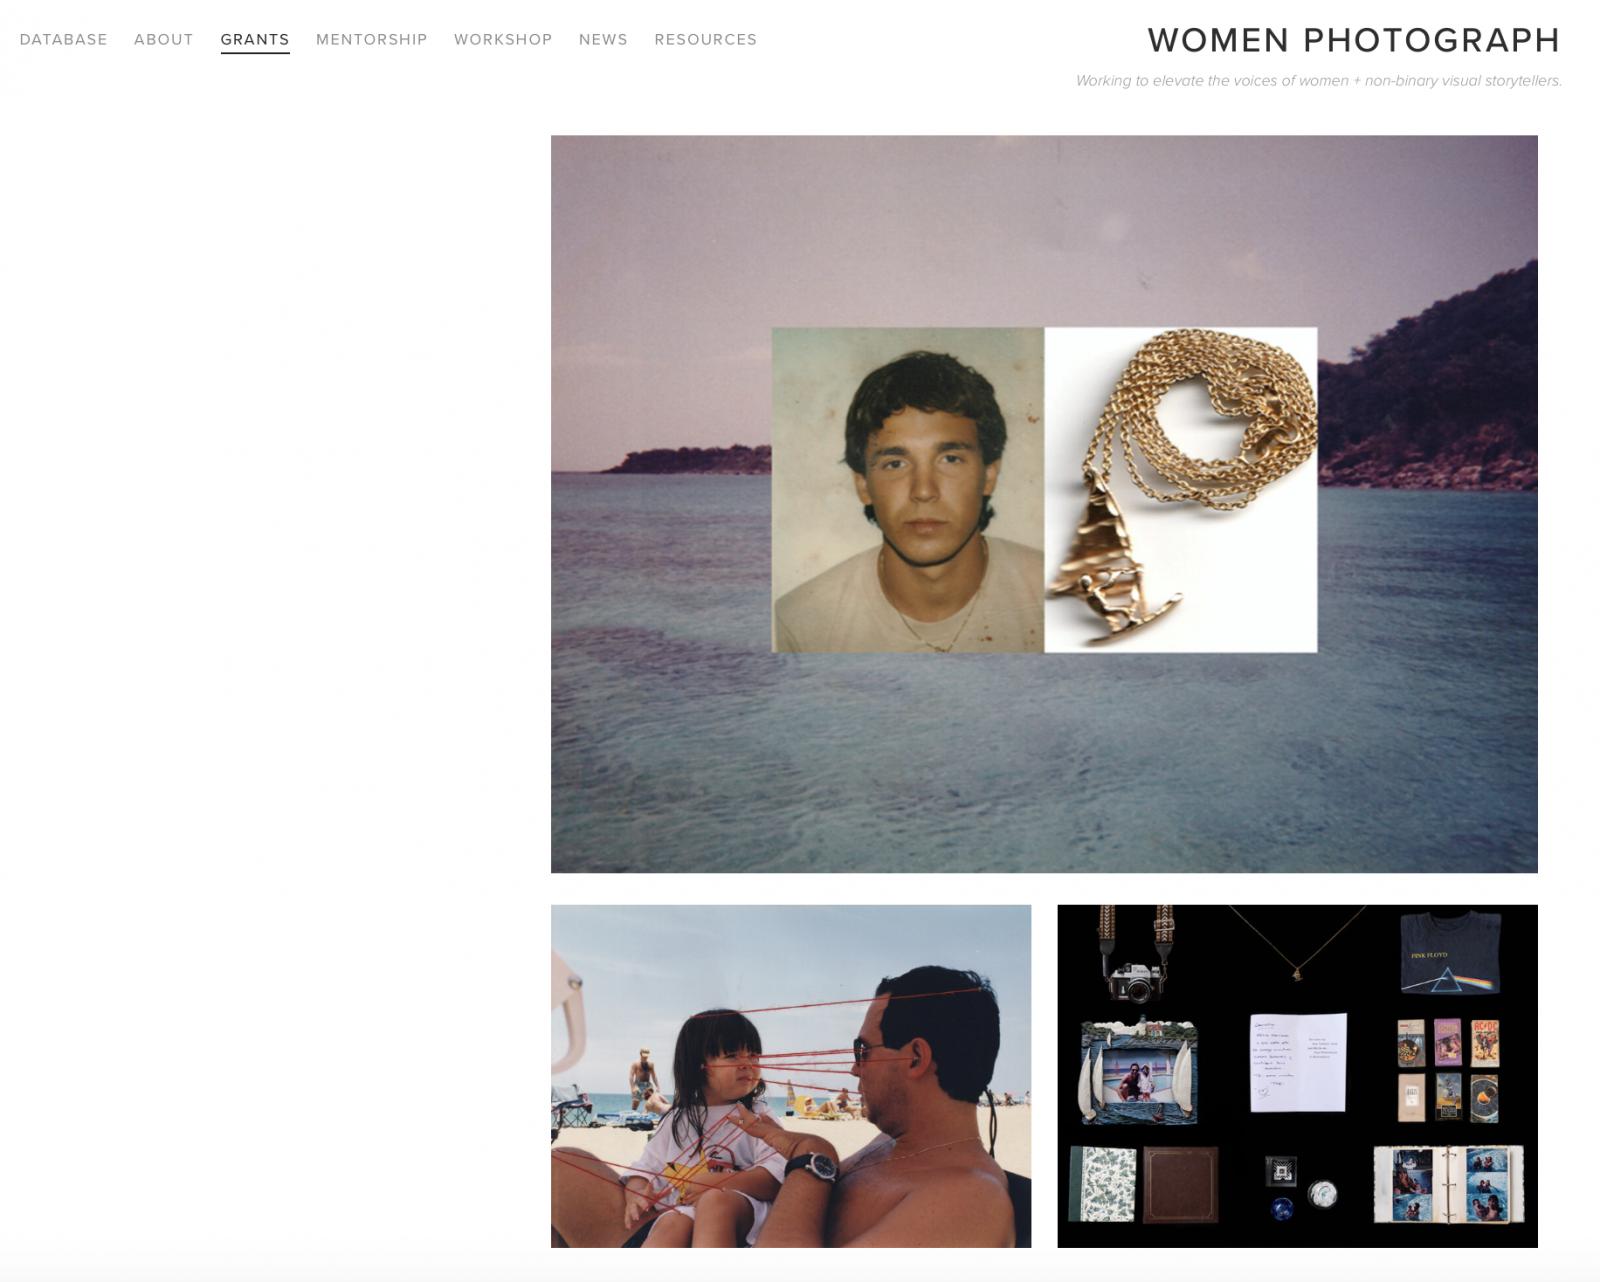 Photography image - Loading Screen_Shot_2020-07-10_at_6.56.05_PM.png